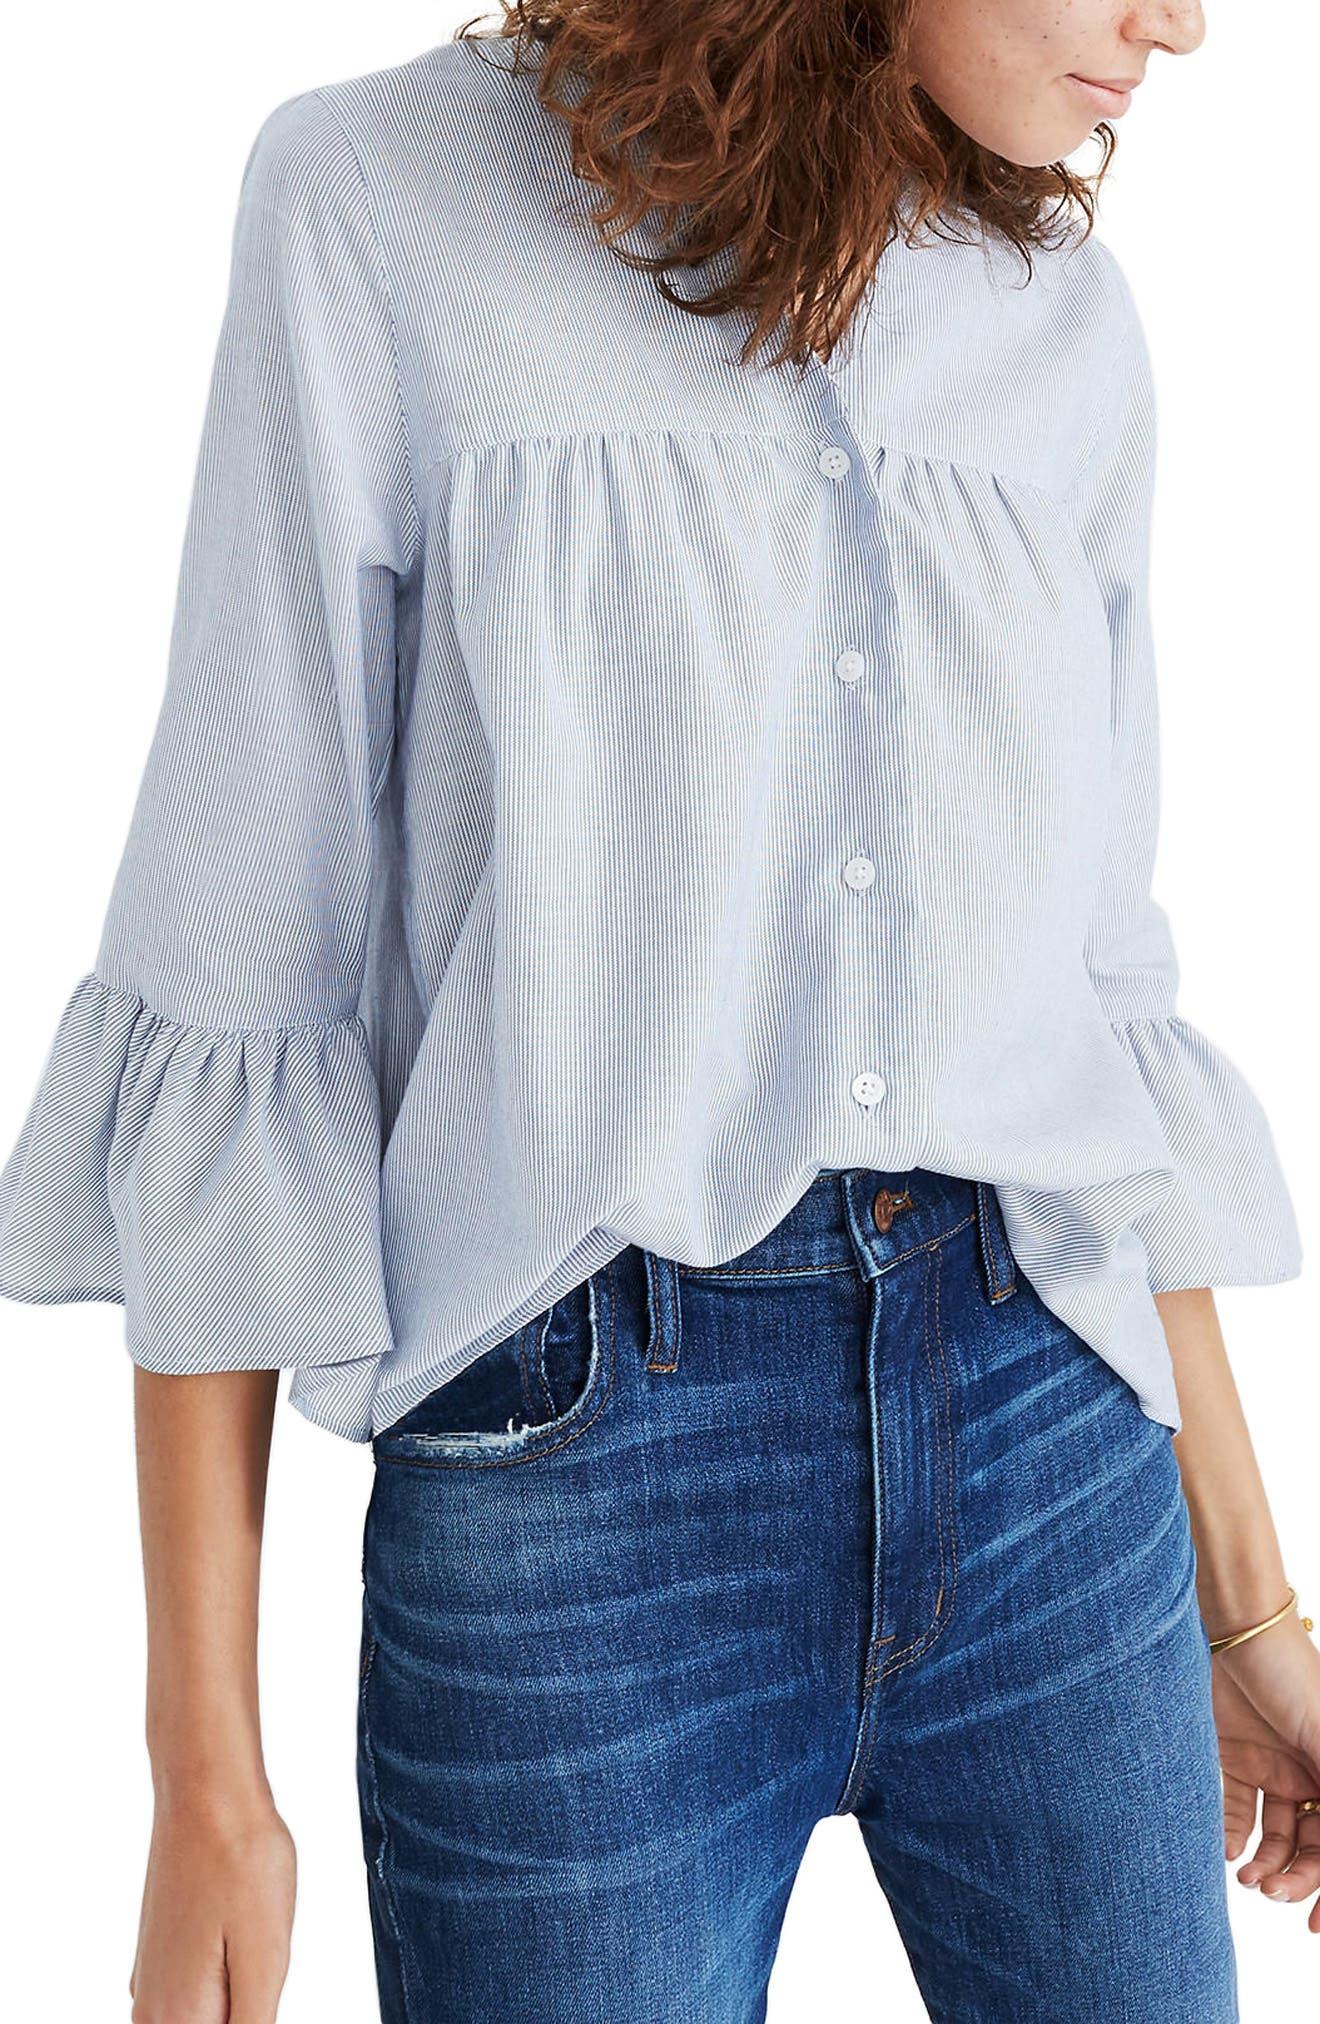 Veranda Bell Sleeve Shirt,                             Main thumbnail 1, color,                             Royal Blue